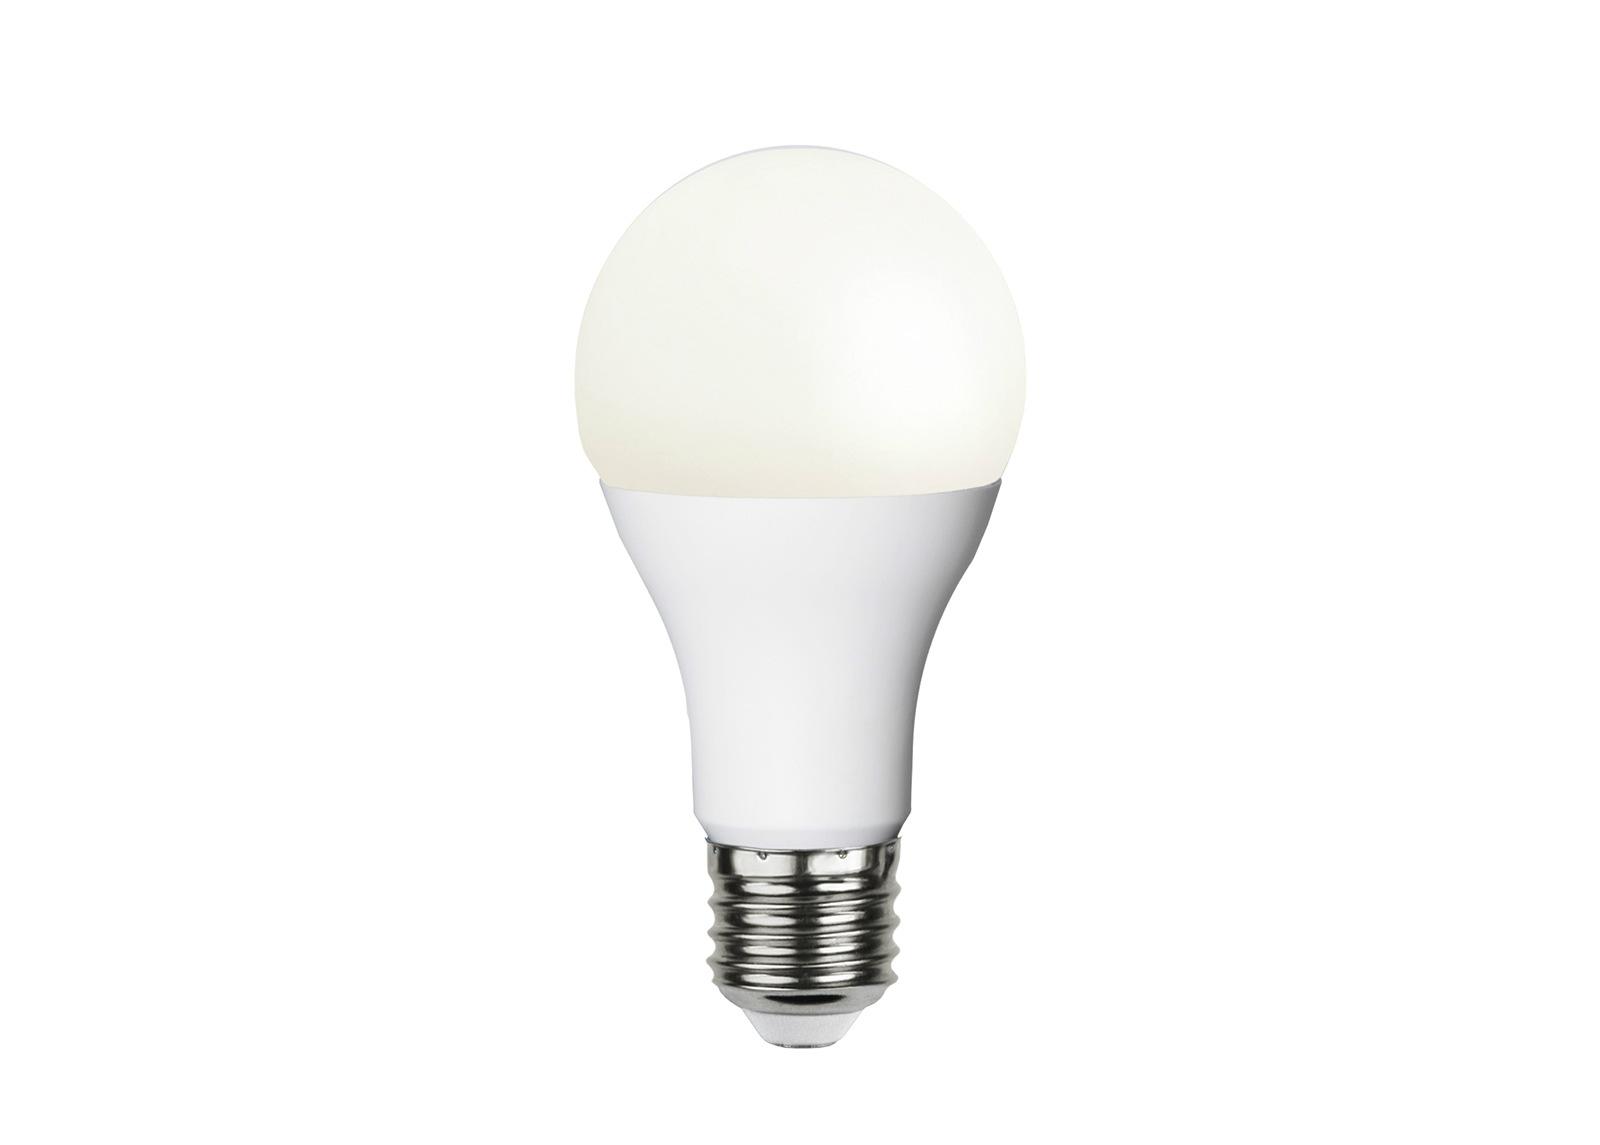 LED sähkölamppu E27 15 W